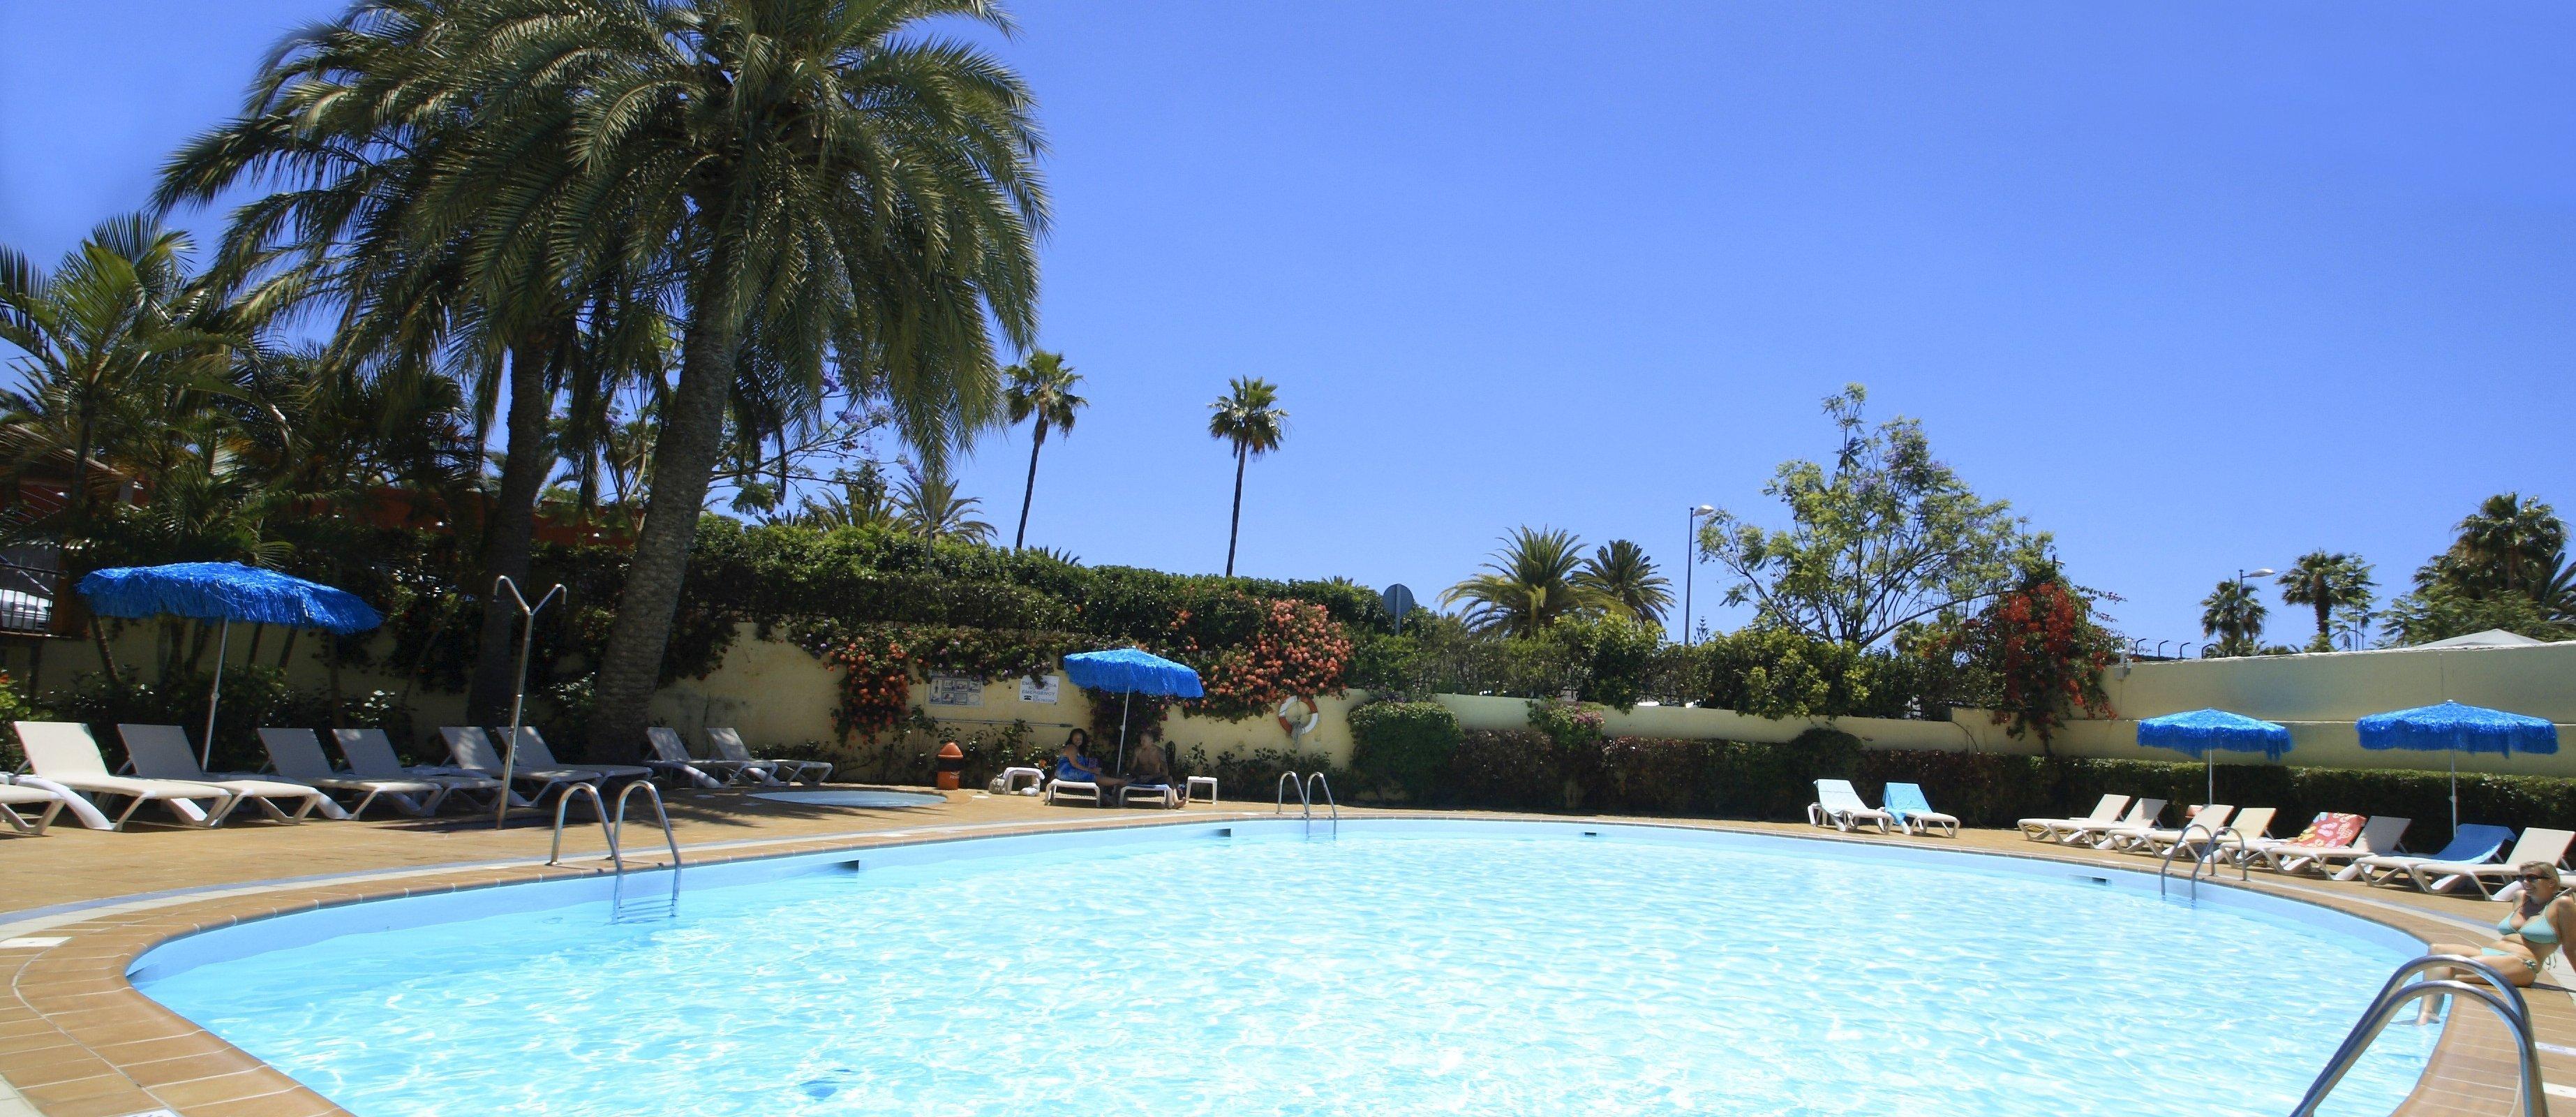 Hotel hl rondo in playa del ingl s gran canaria for Design hotel gran canaria